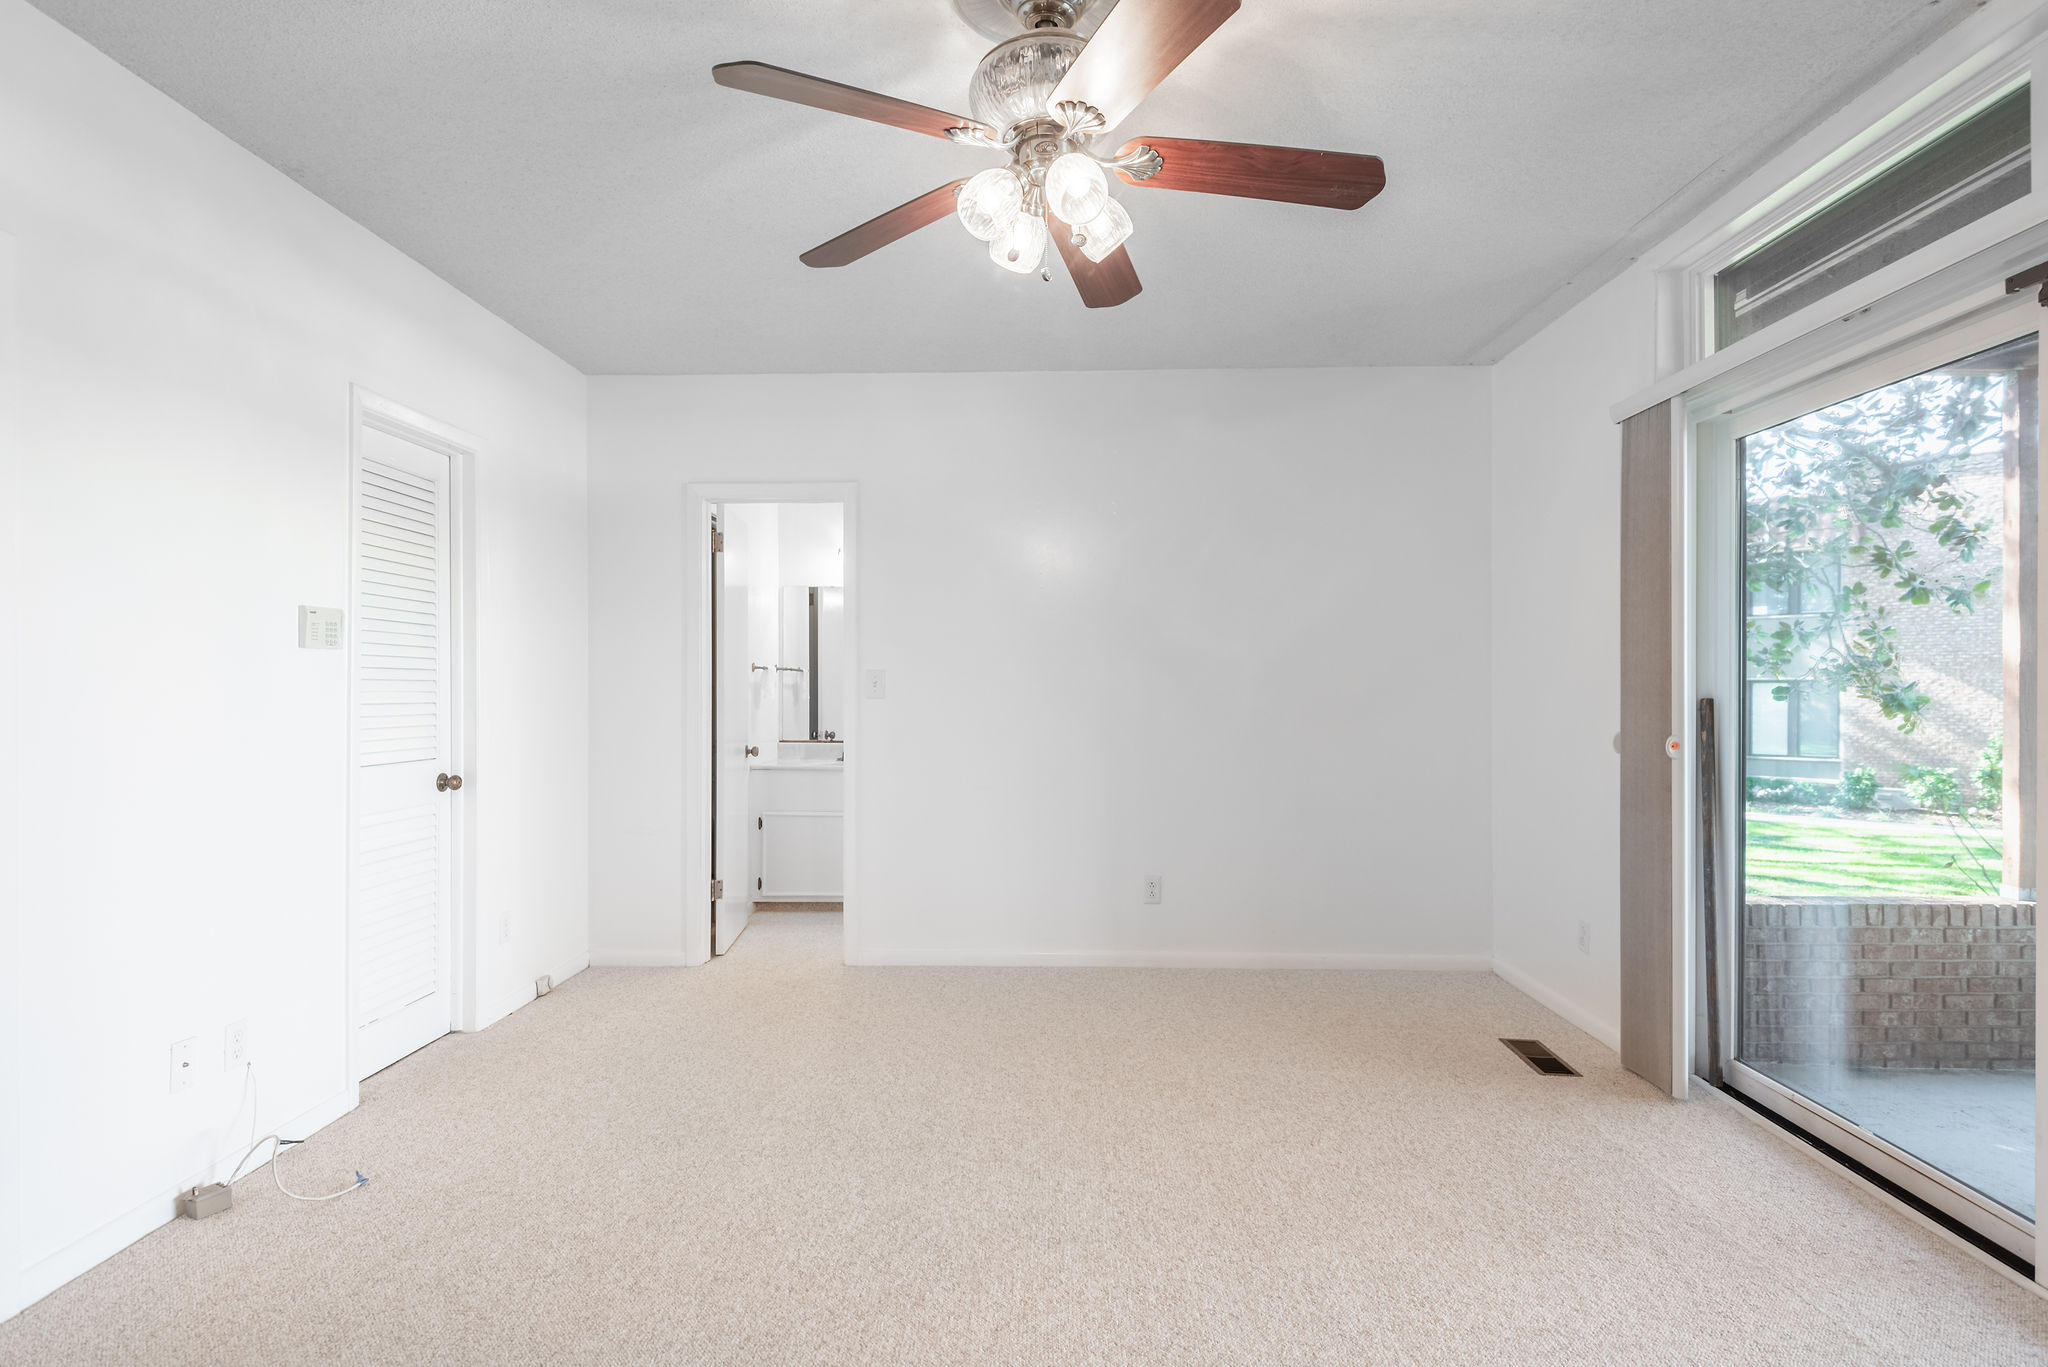 220 5a 3rd Avenue Charleston, SC 29403